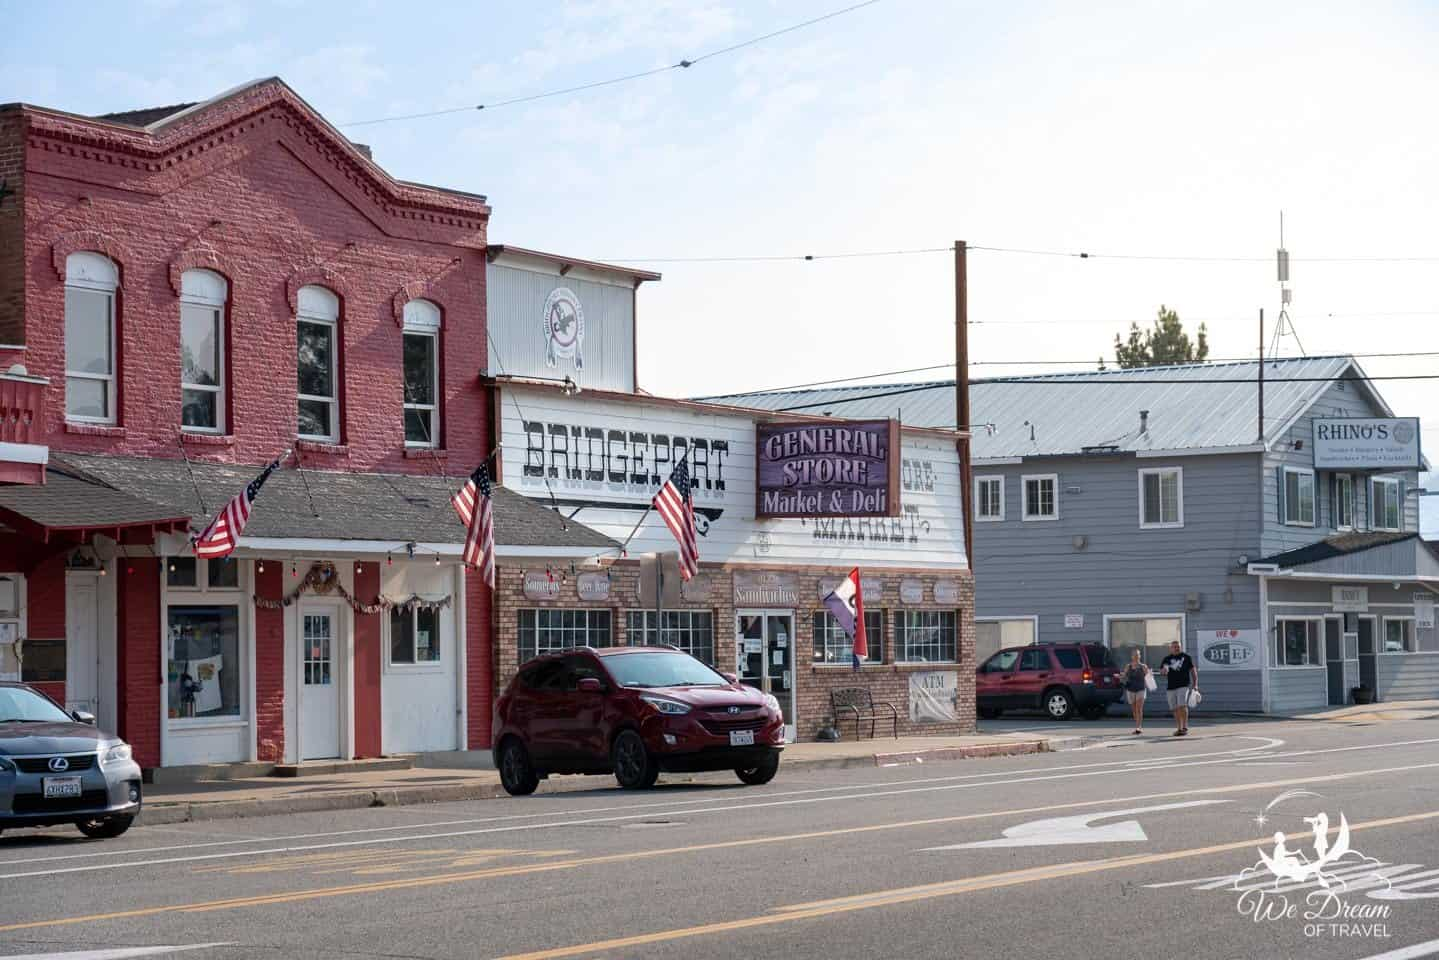 The historic town of Bridgeport, California.